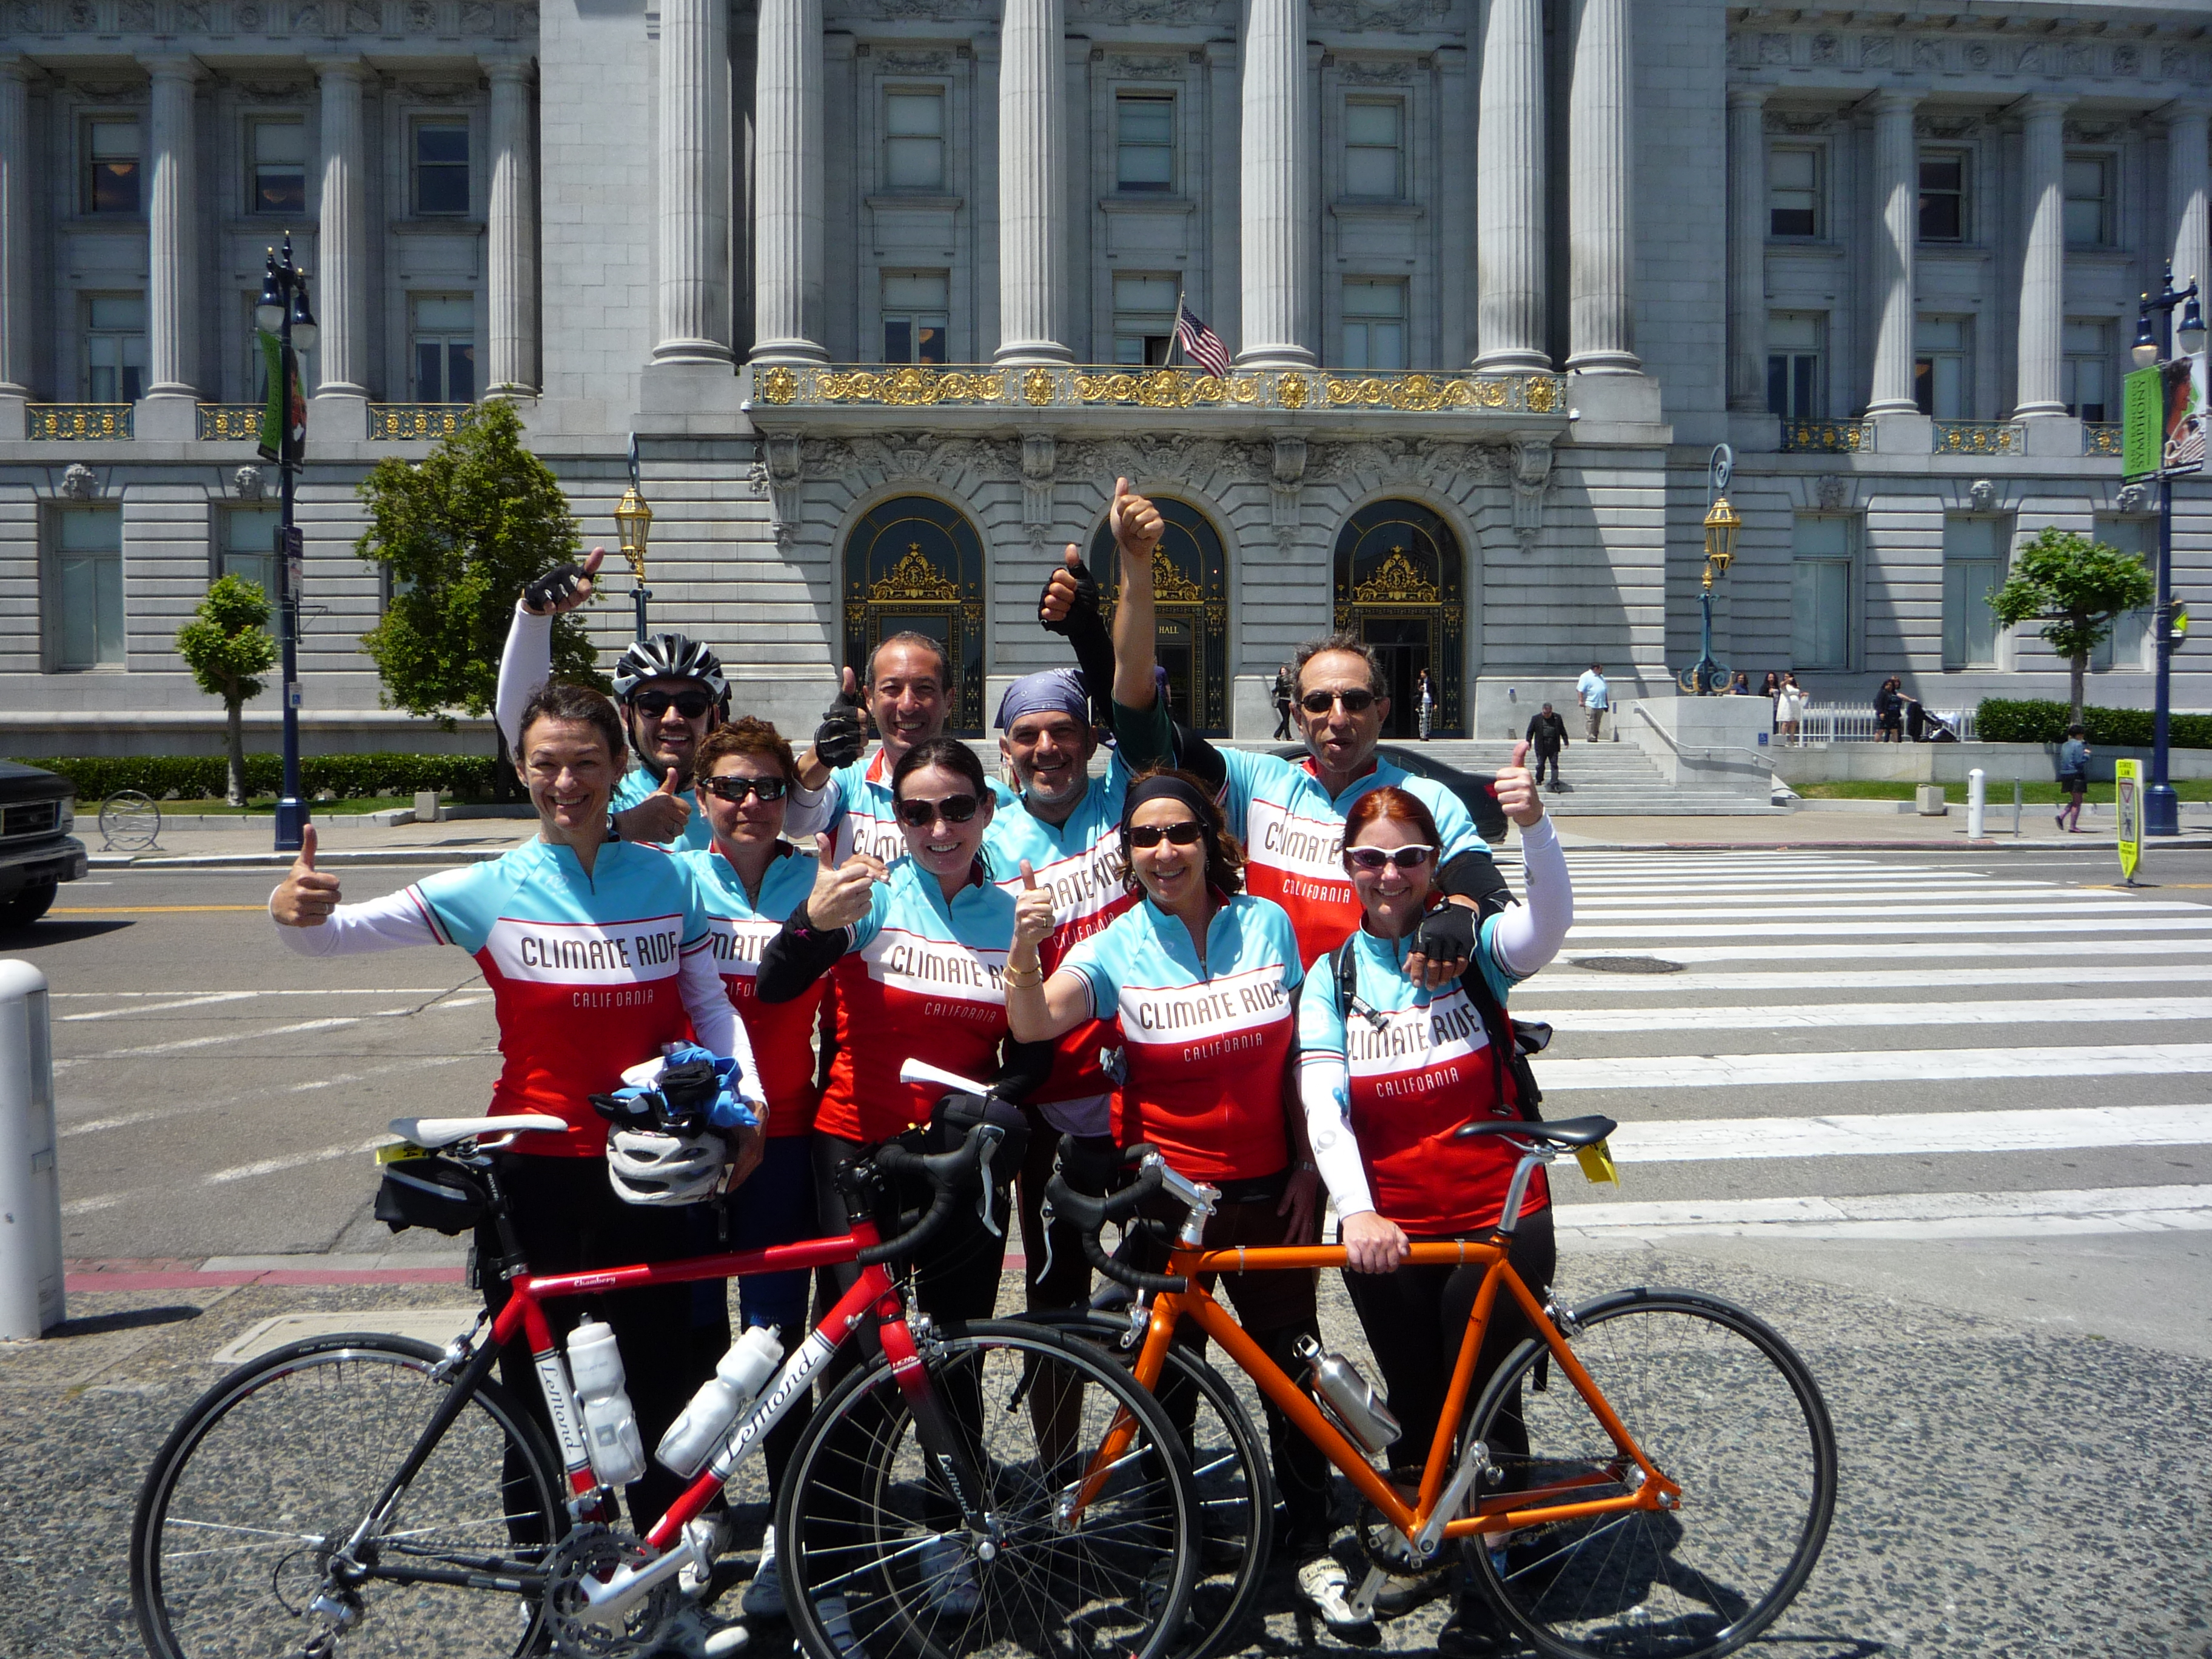 Climate_Ride_13_Team.jpg